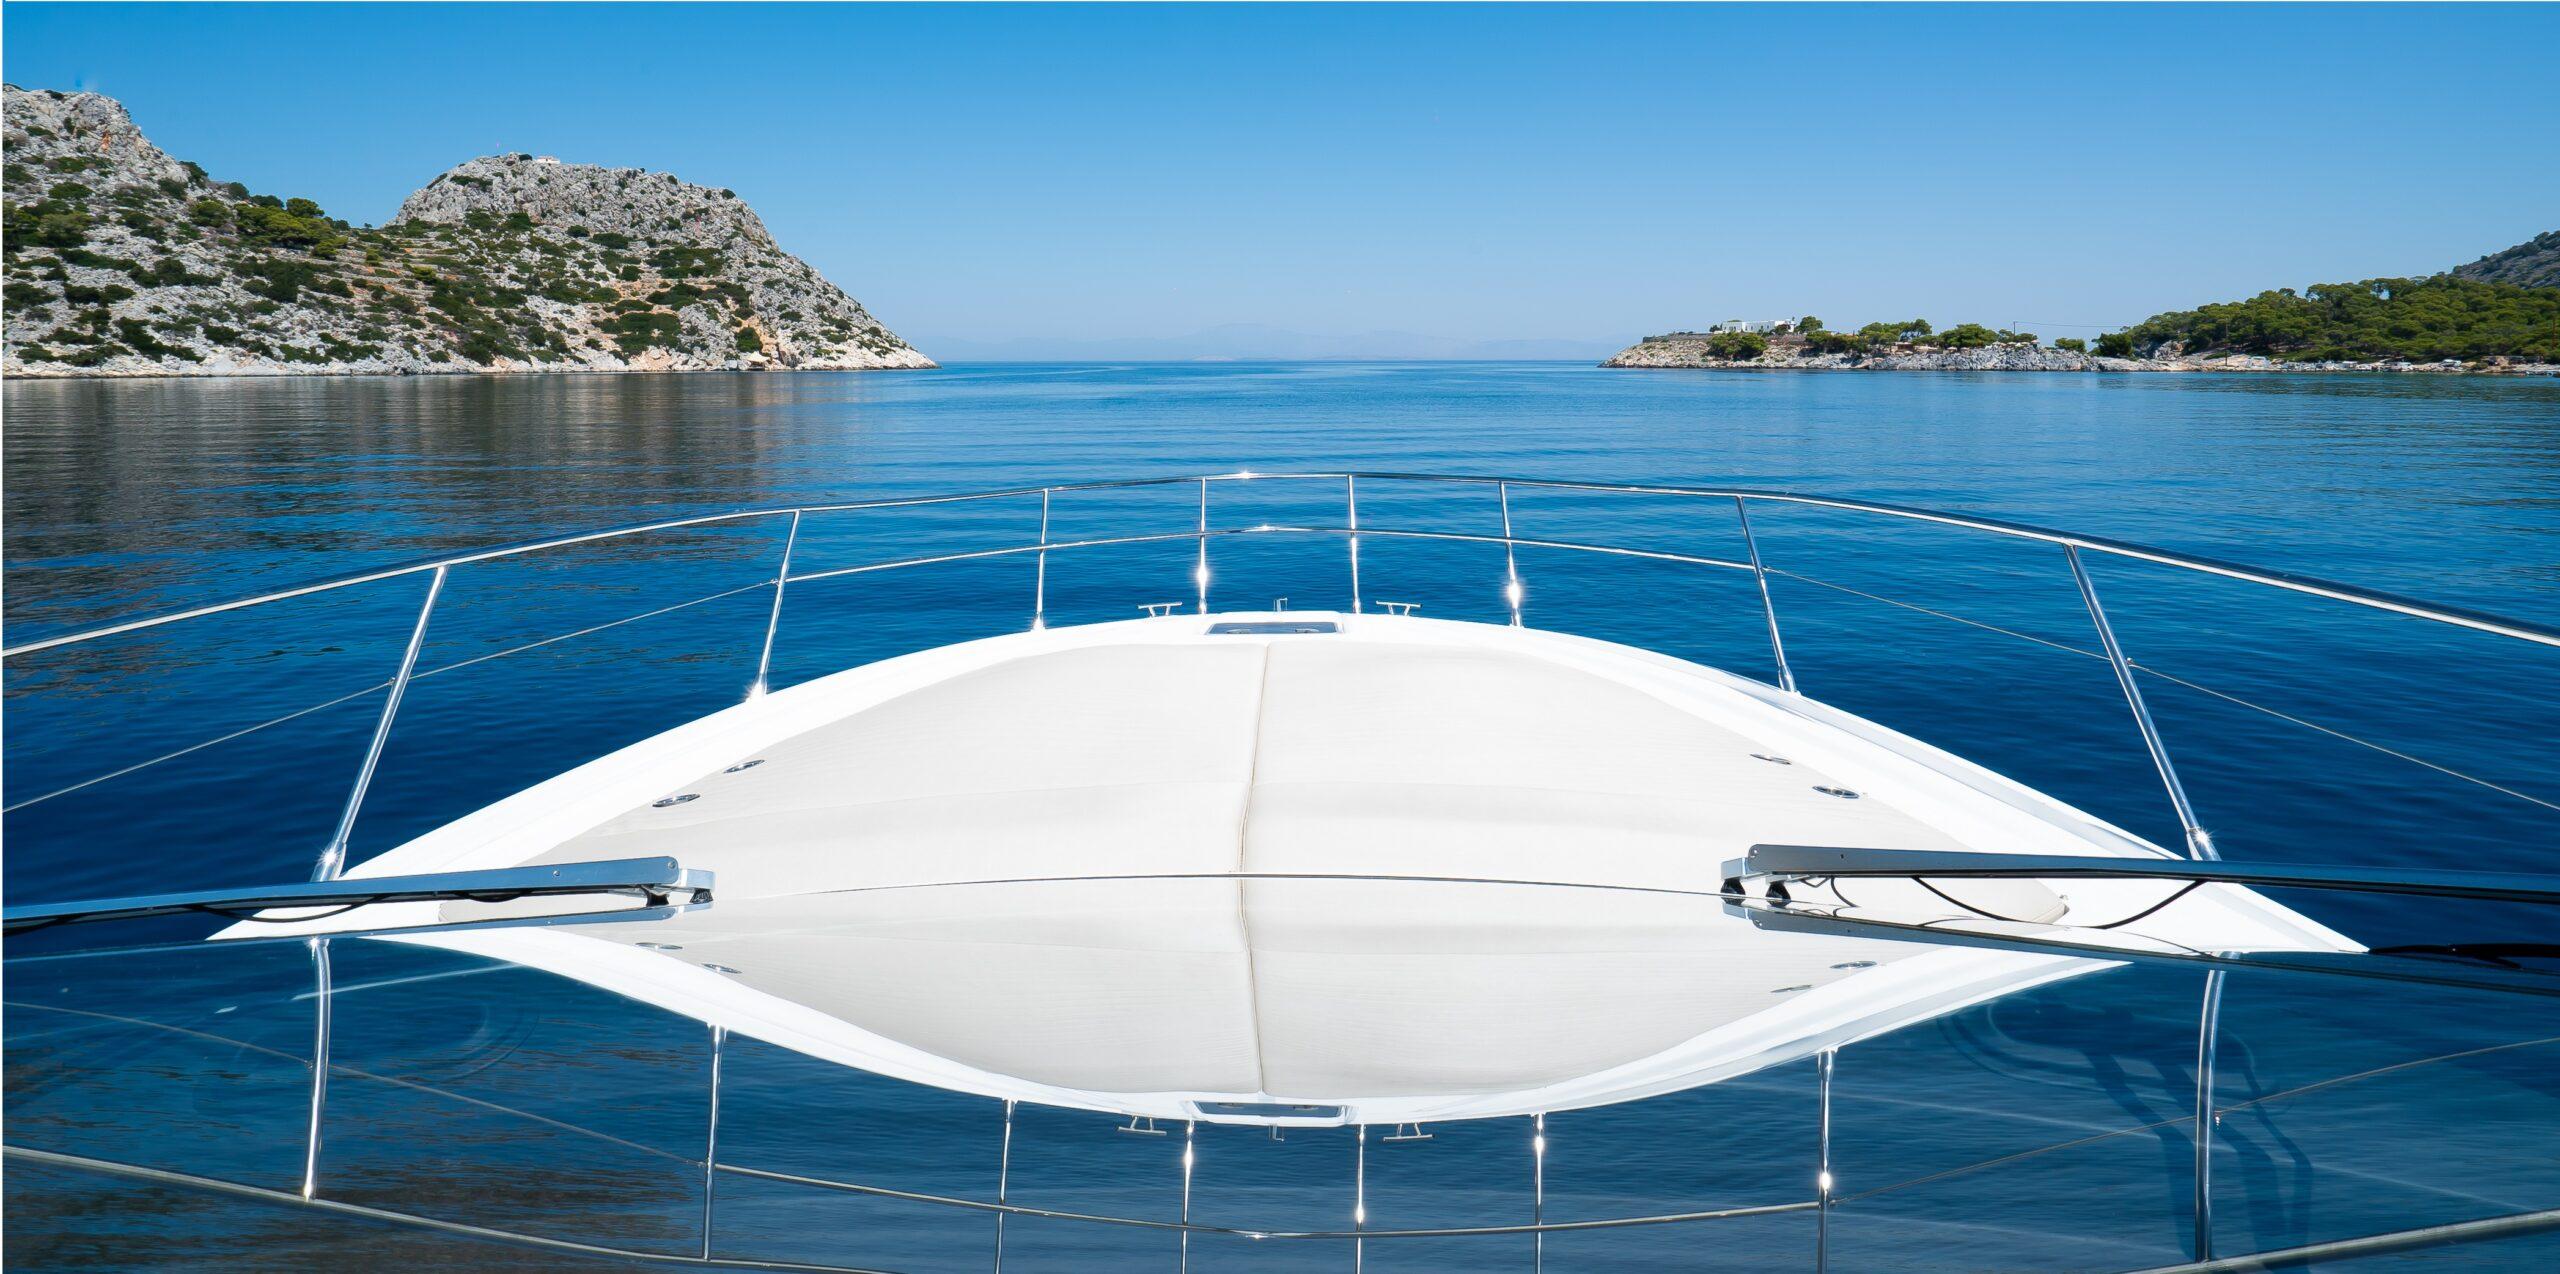 Azimut Atlantis 43: New CA announcement Bonita charter yacht for daily cruises